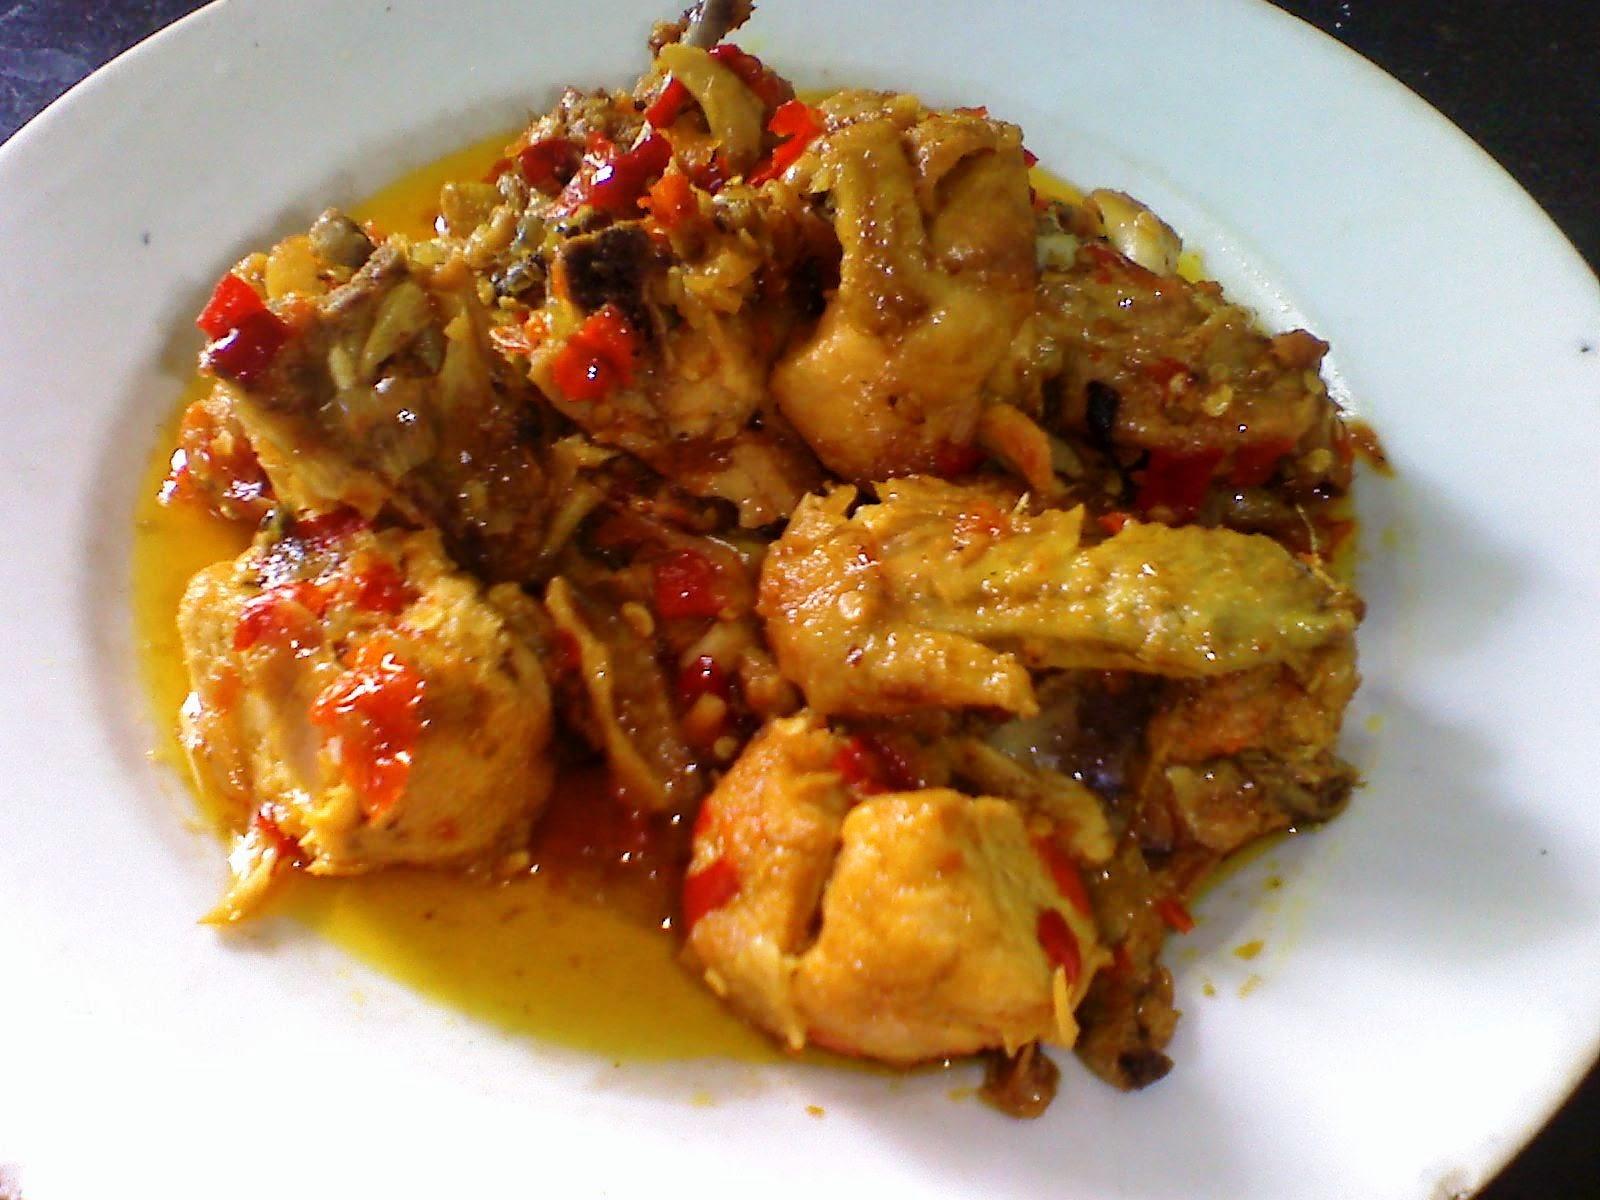 kumpulan resep masakan online resep ayam rica rica khas